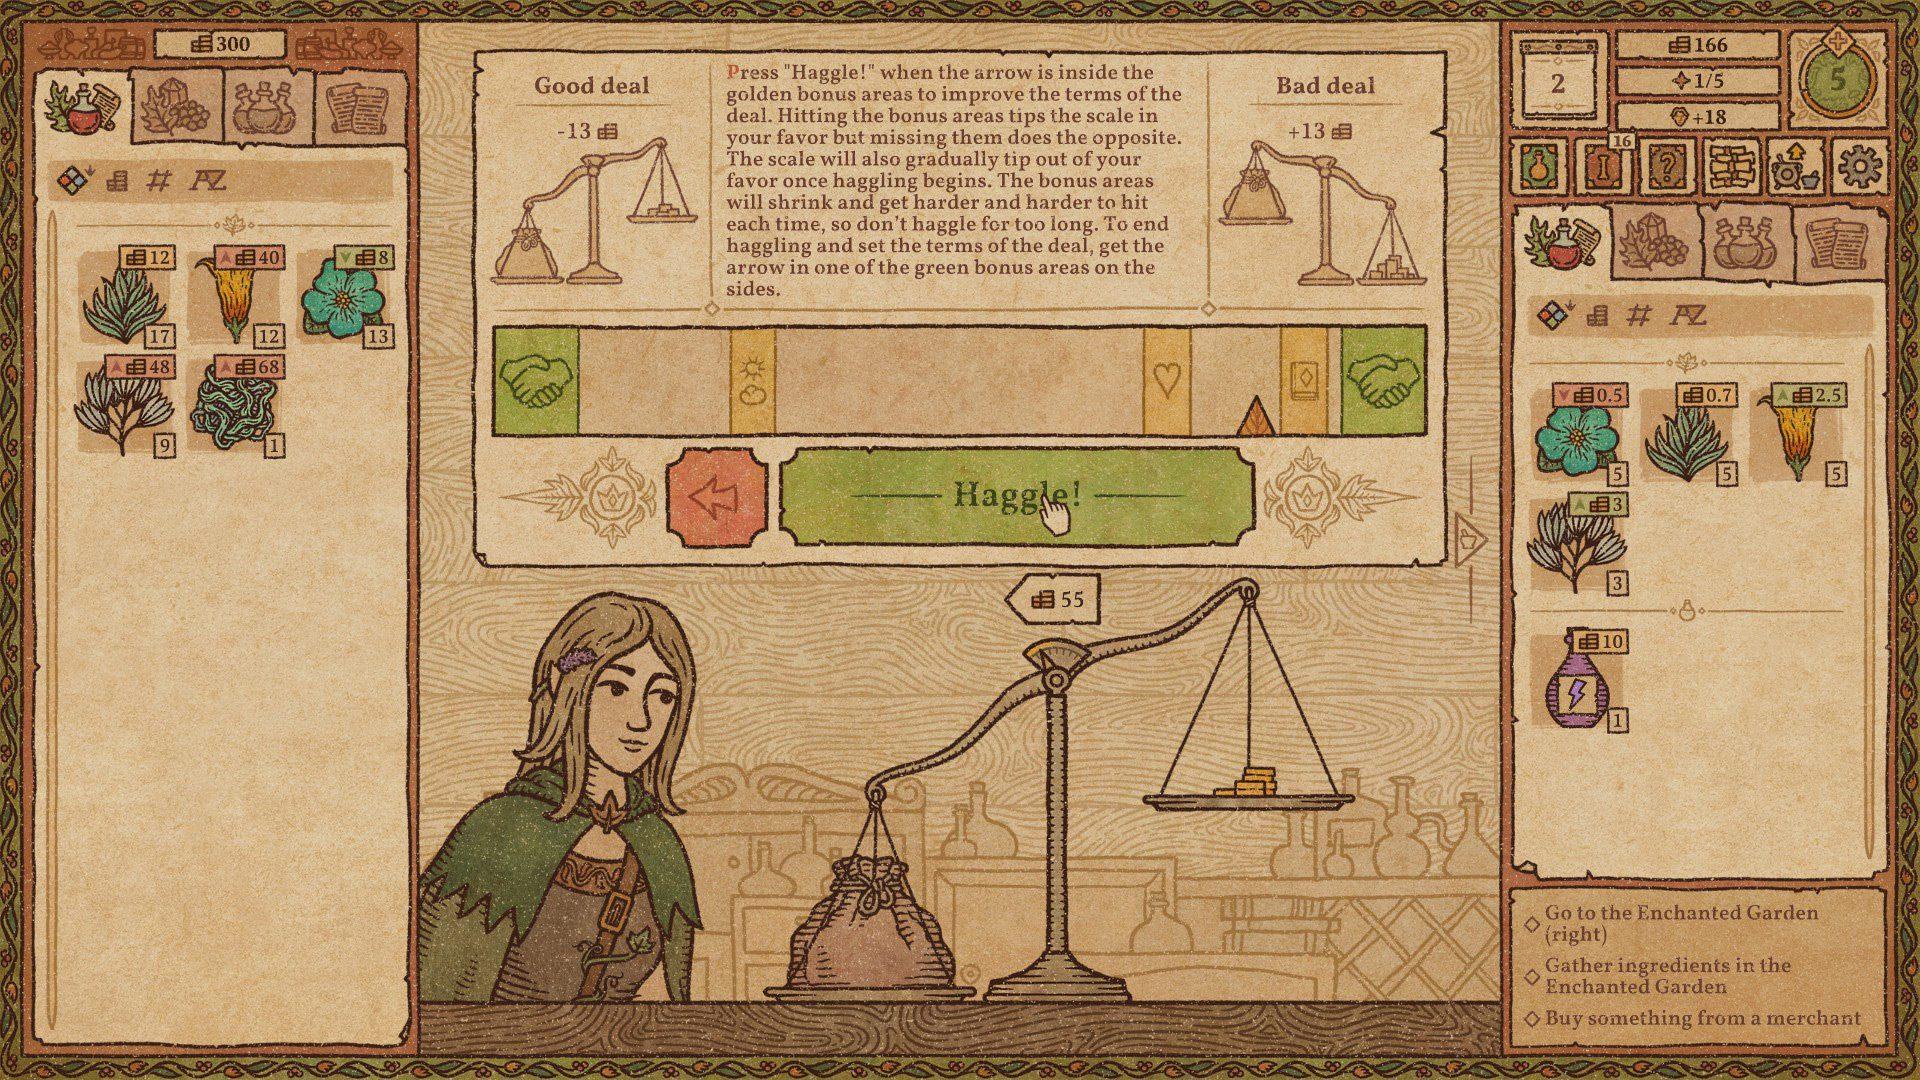 The haggling mini-game in Potion Craft: Alchemist Simulator